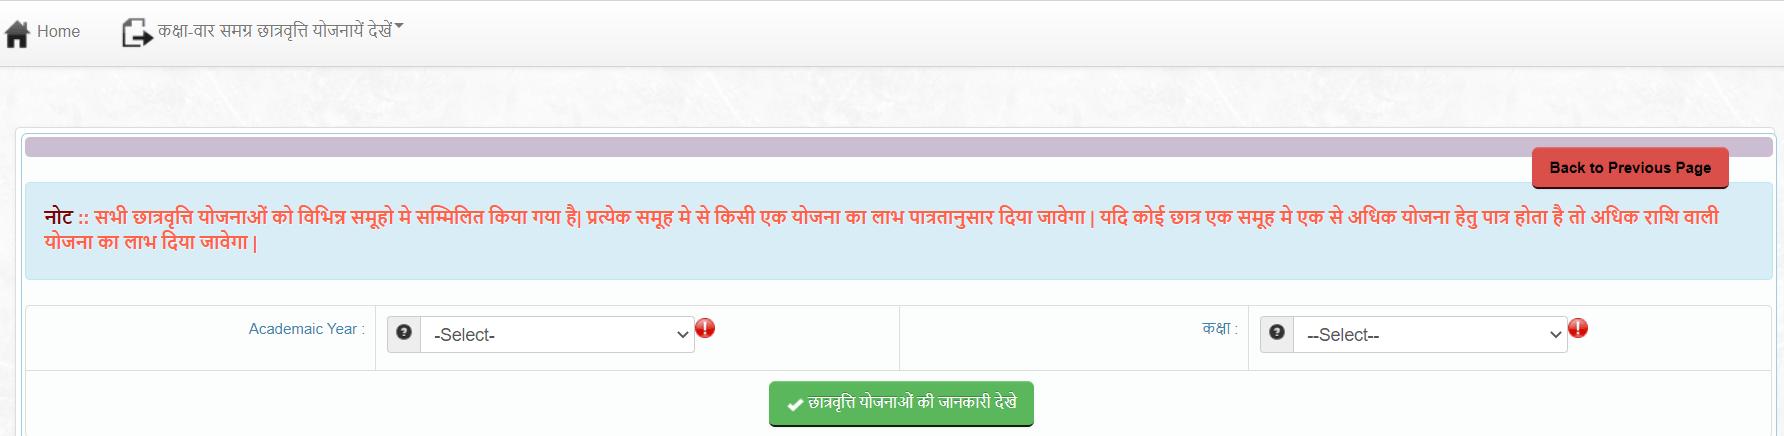 MP-Siksha-Portal